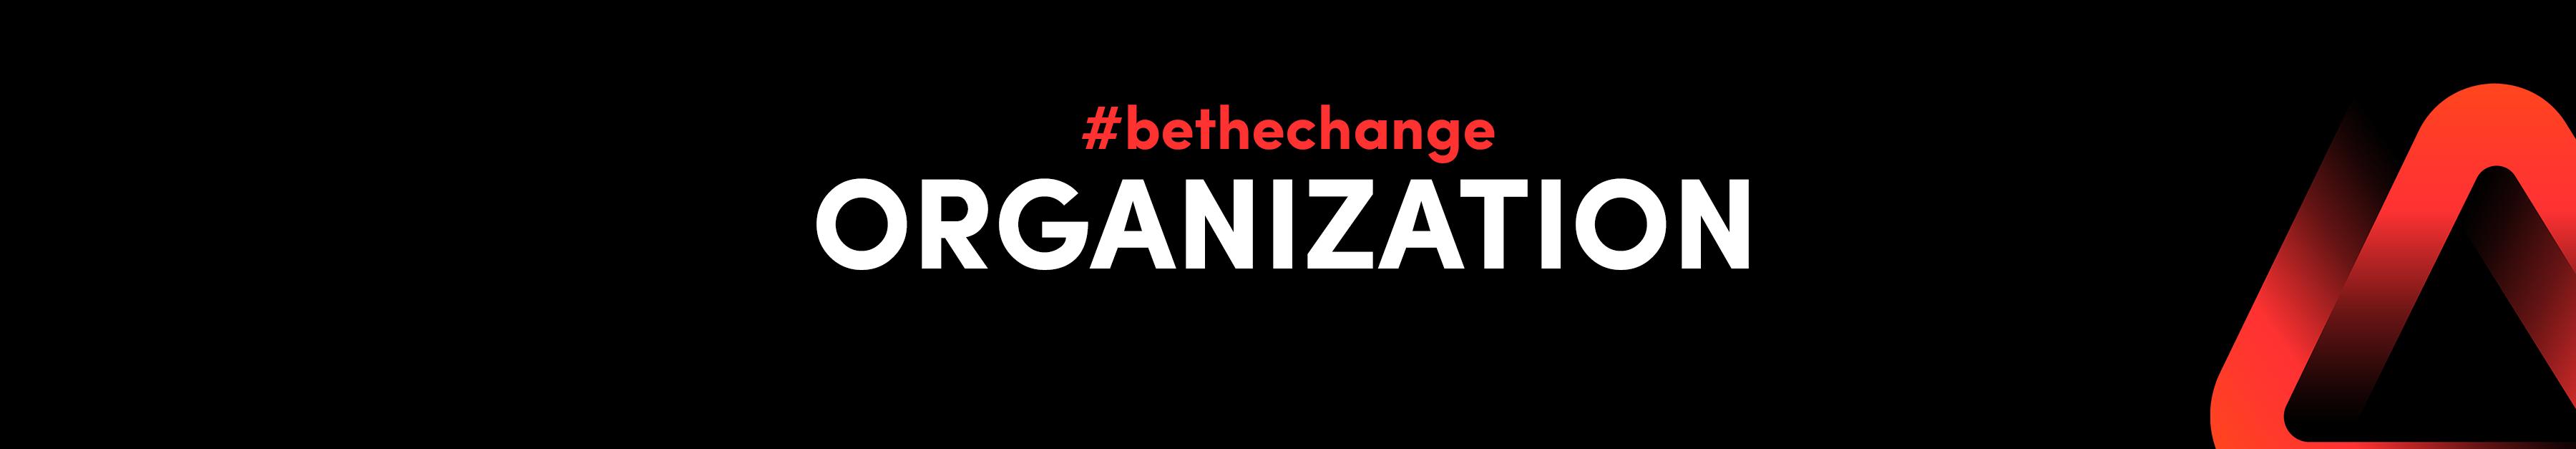 #bethechange Organization - Membership as organization, NGO or NPO 1